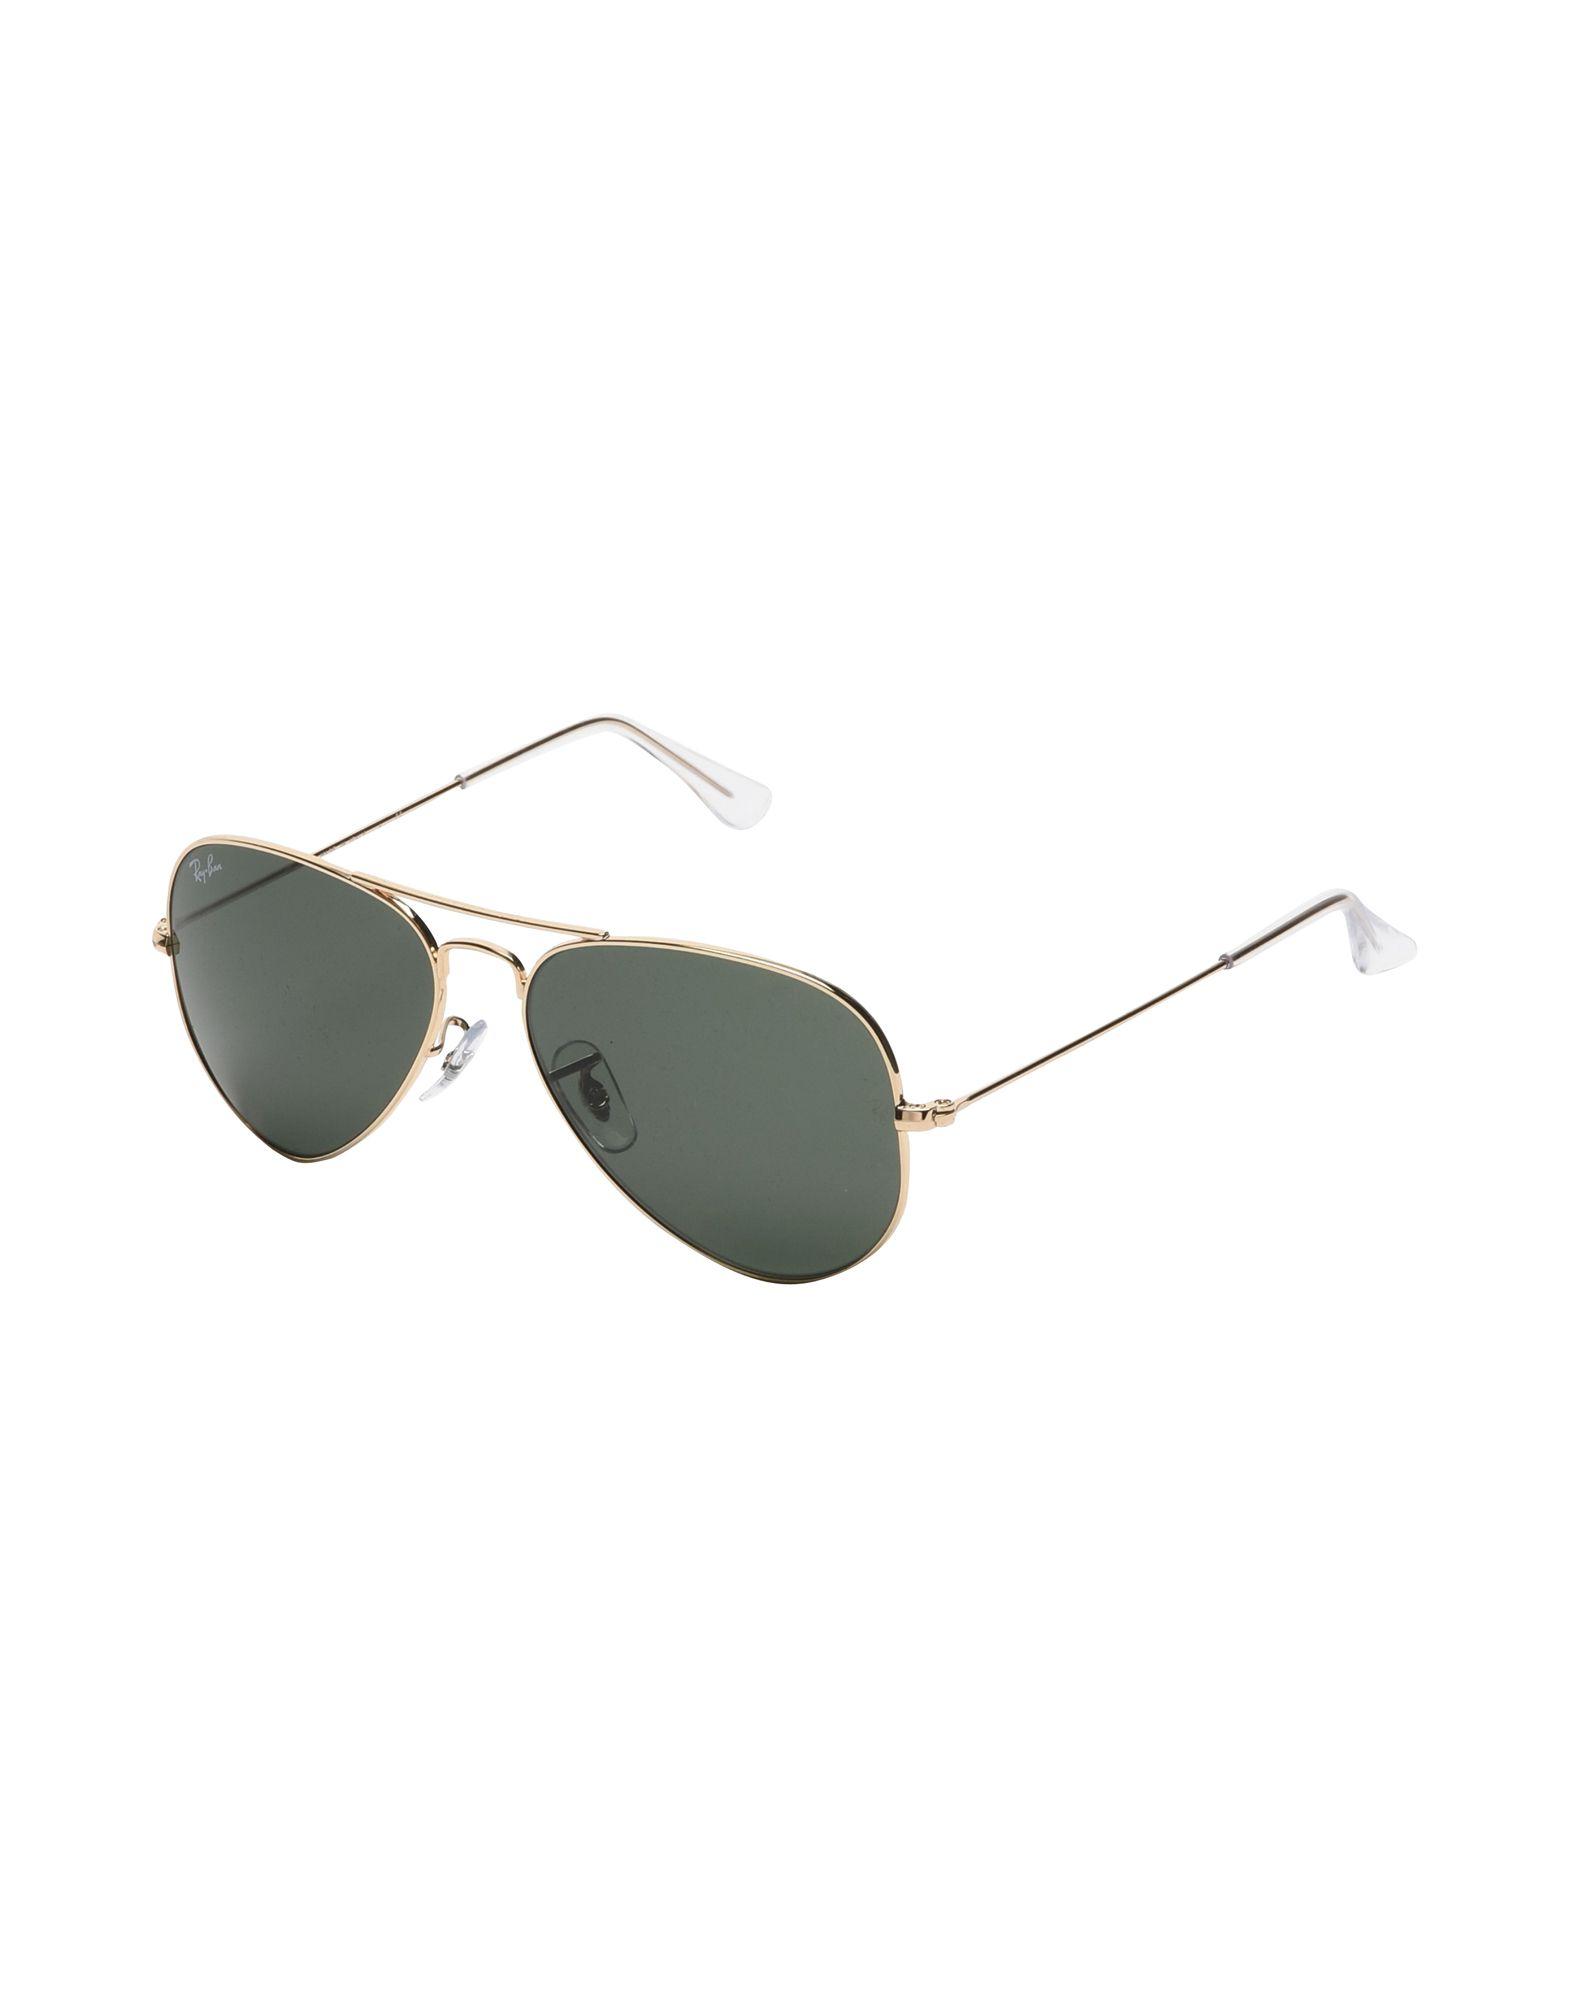 RAY-BAN Солнечные очки очки ray ban 0rb3025 004 5858